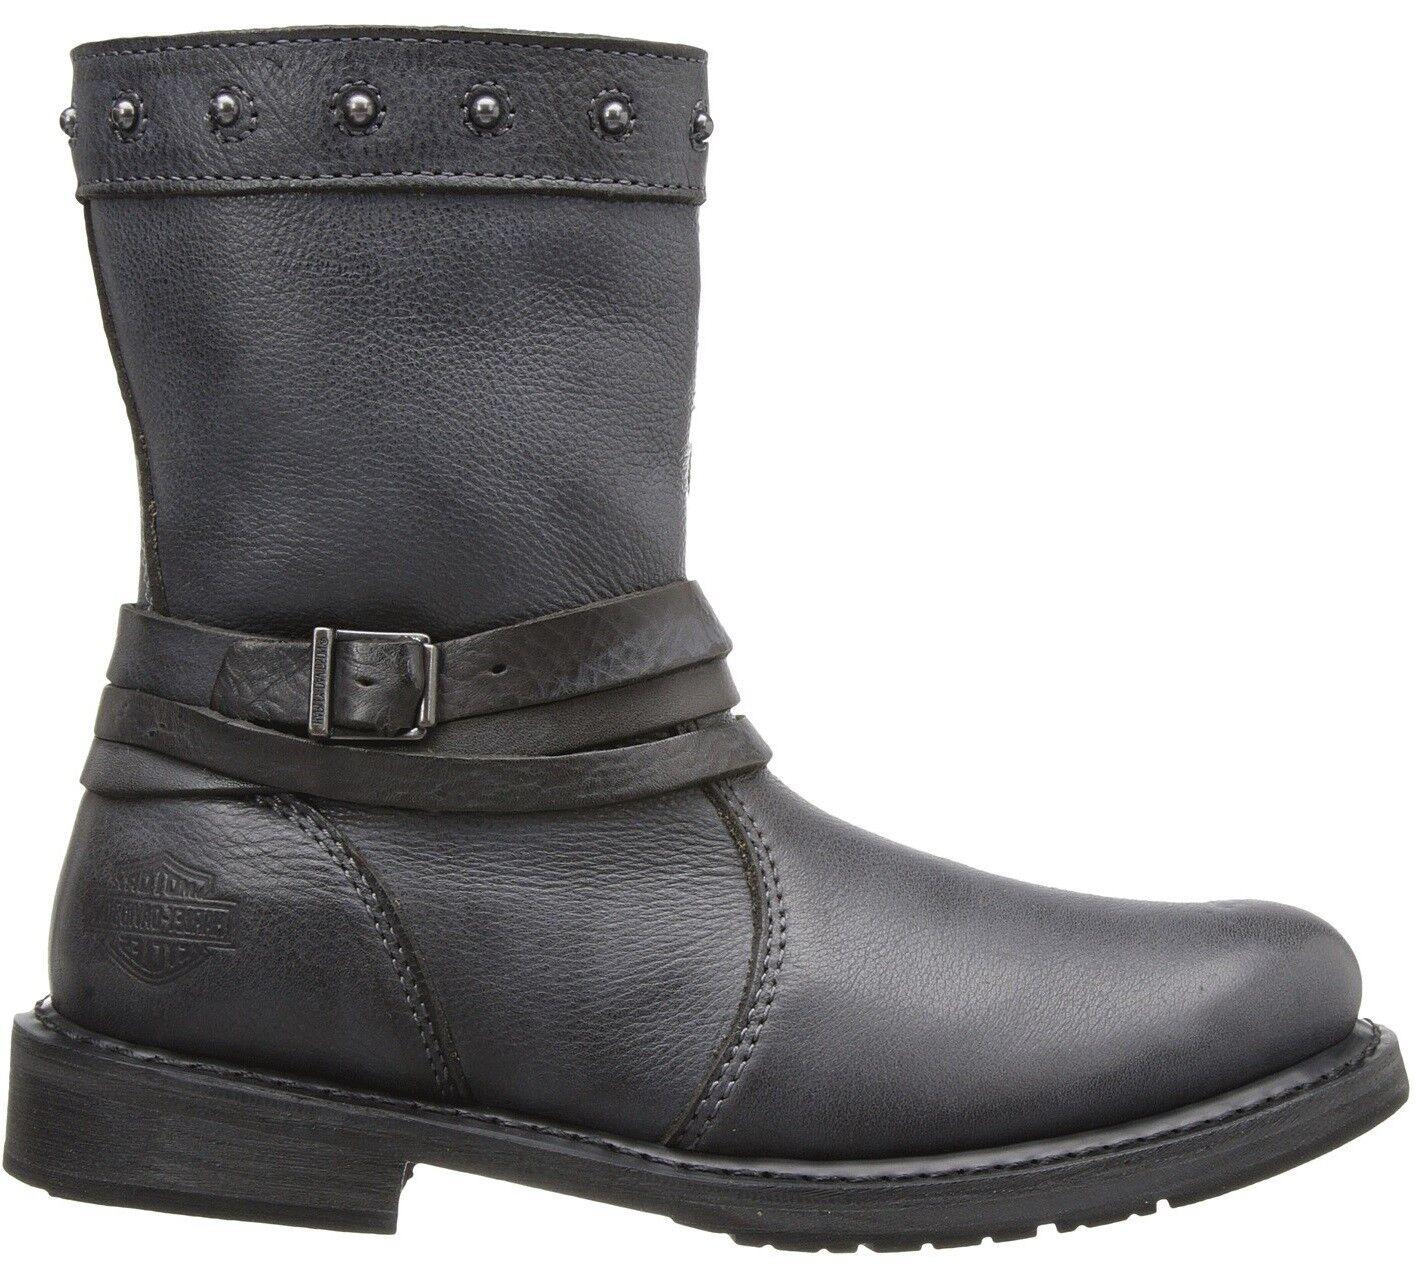 Harley Davidson Ladies Mandy Grey Slate Leather Boot  Biker Boots Straps Rider